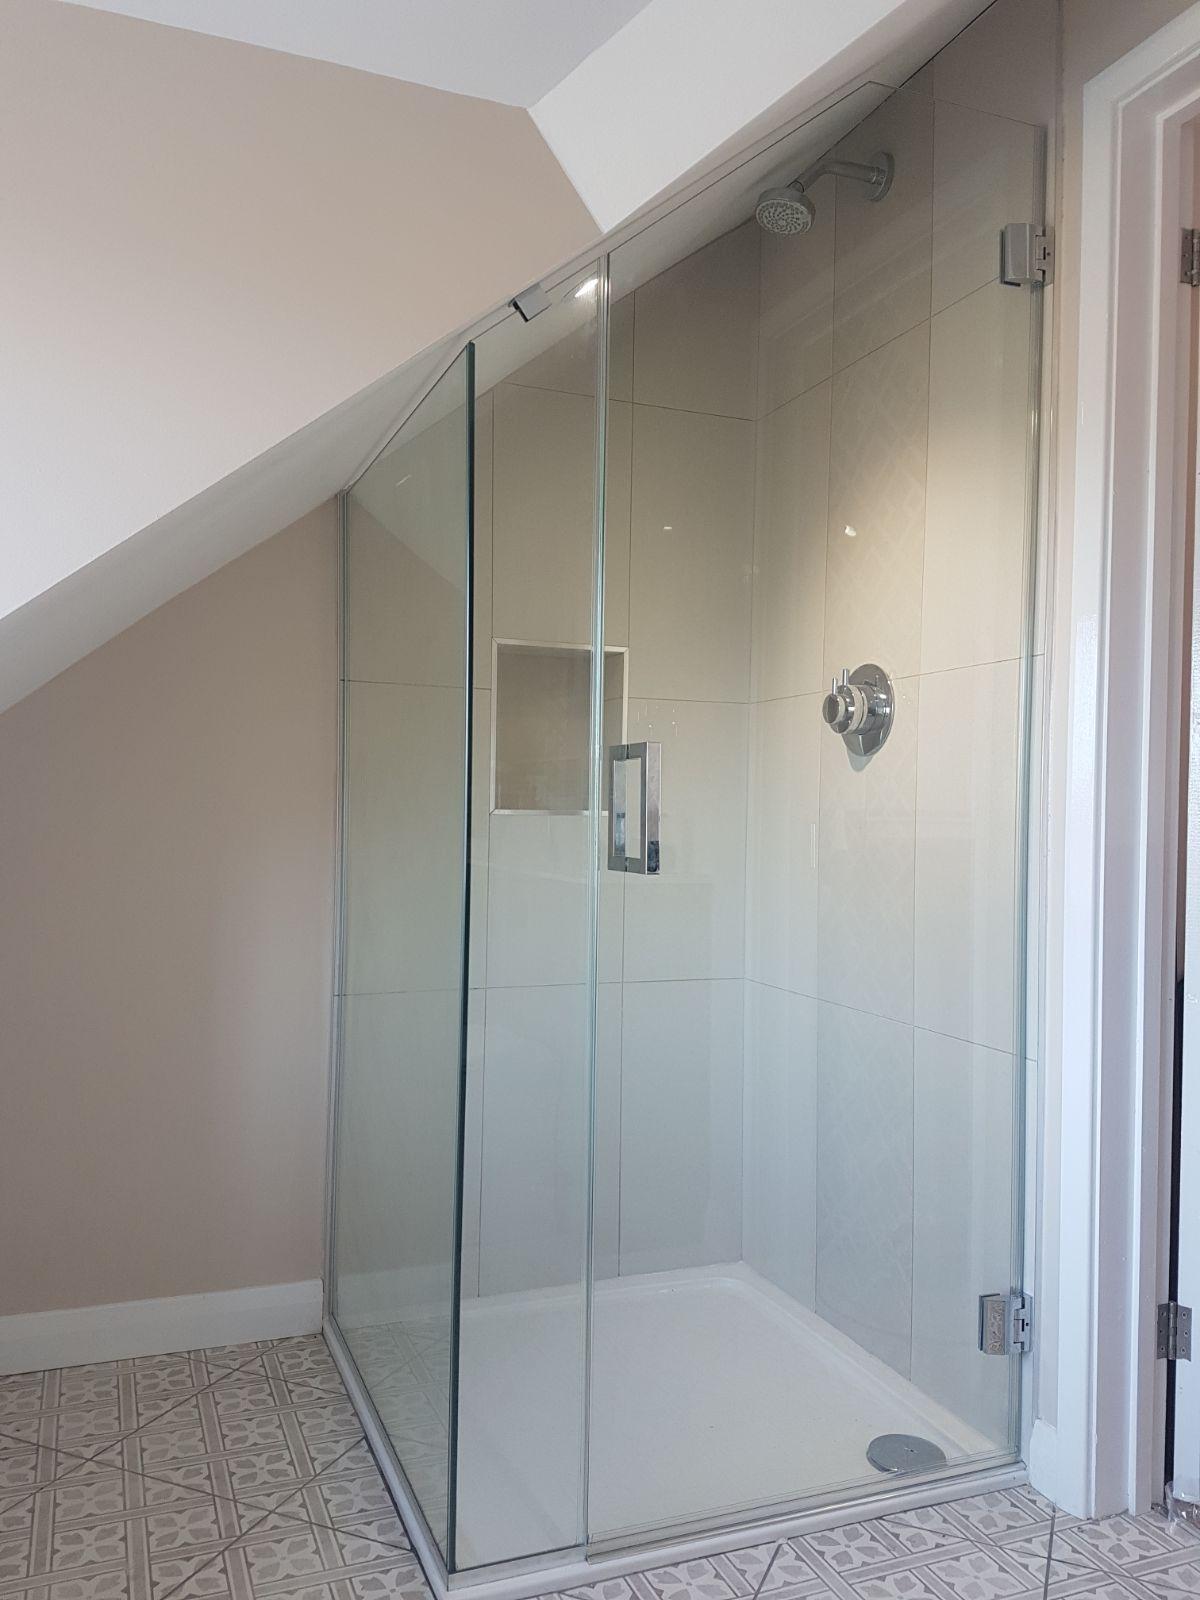 Frameless Attic Shower Enclosure Installed In Kent Attic Shower Attic Bathroom Loft Bathroom